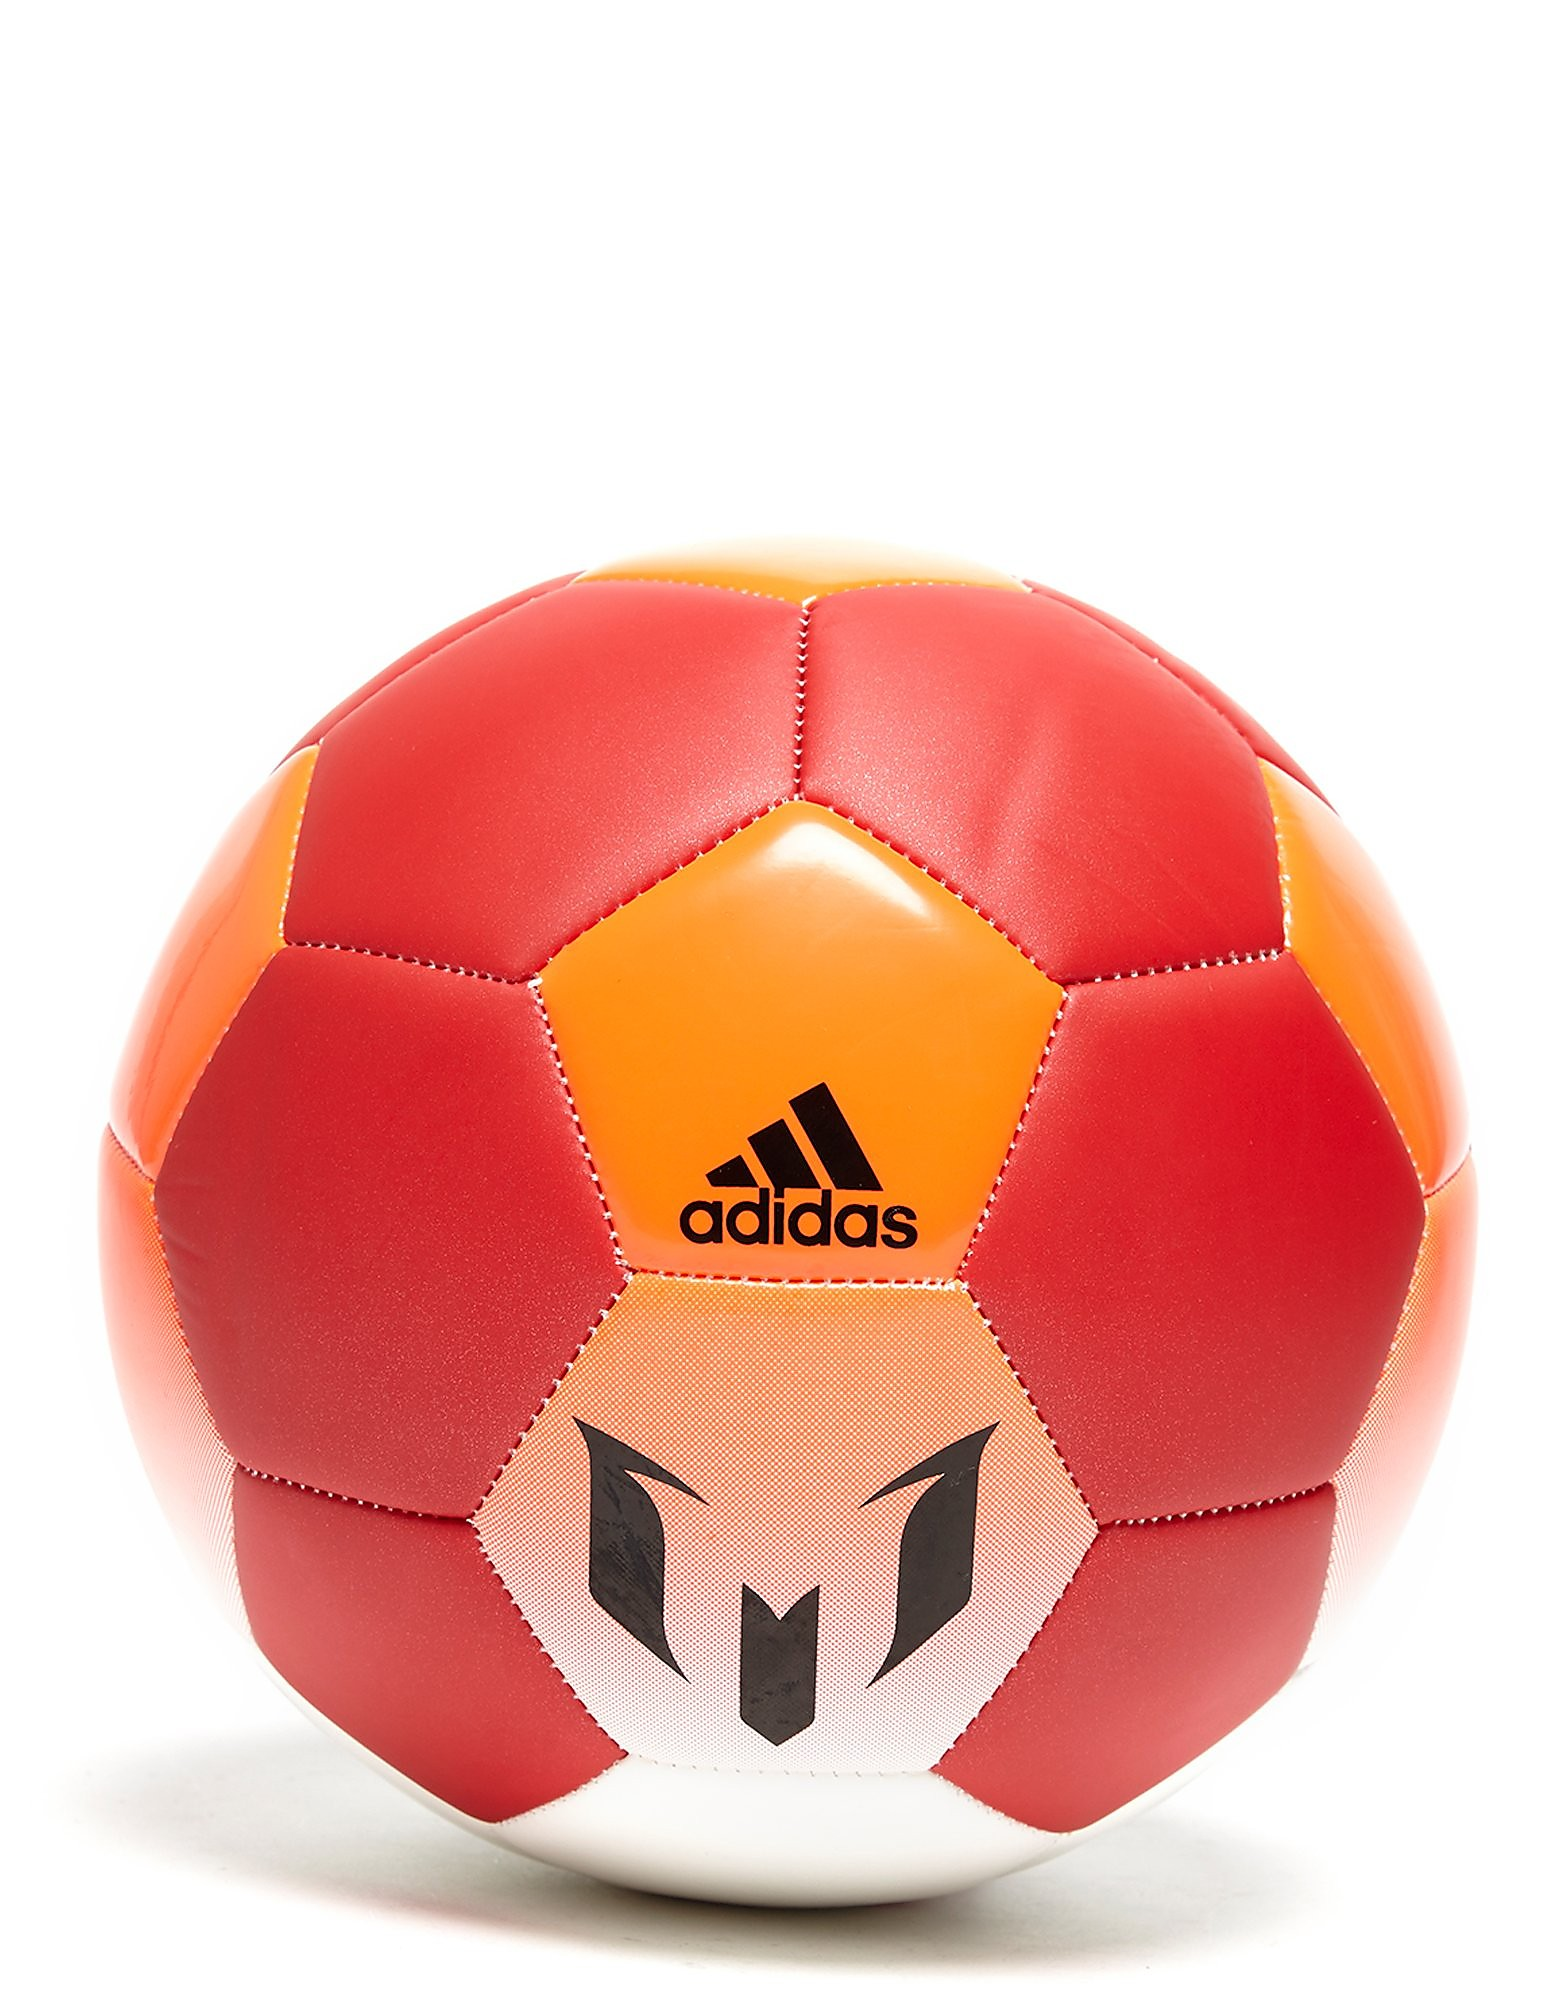 adidas Messi Football